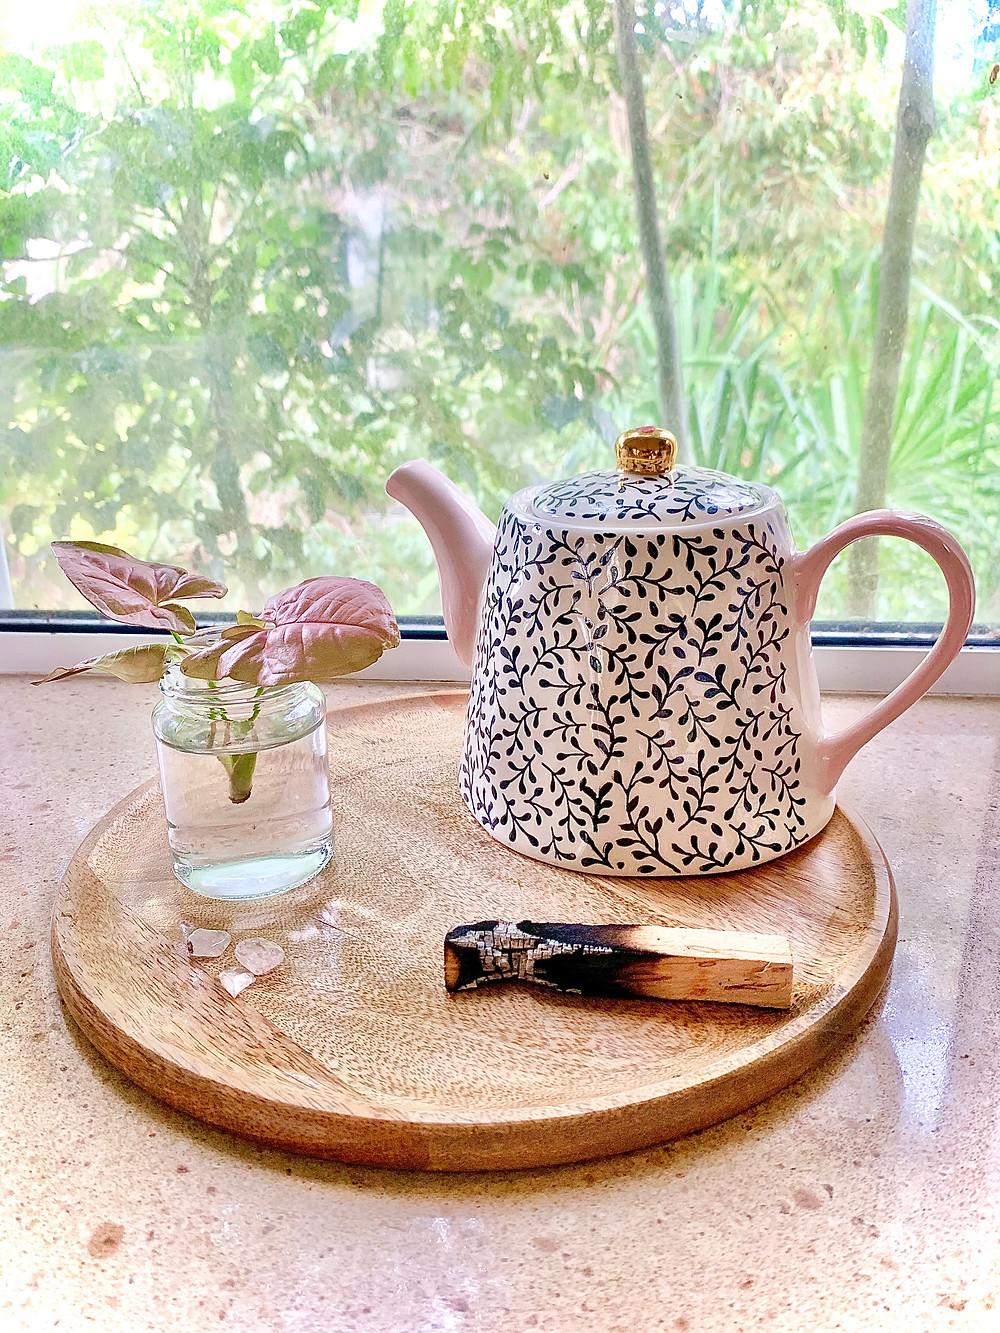 damiana tea, intuition bath blend